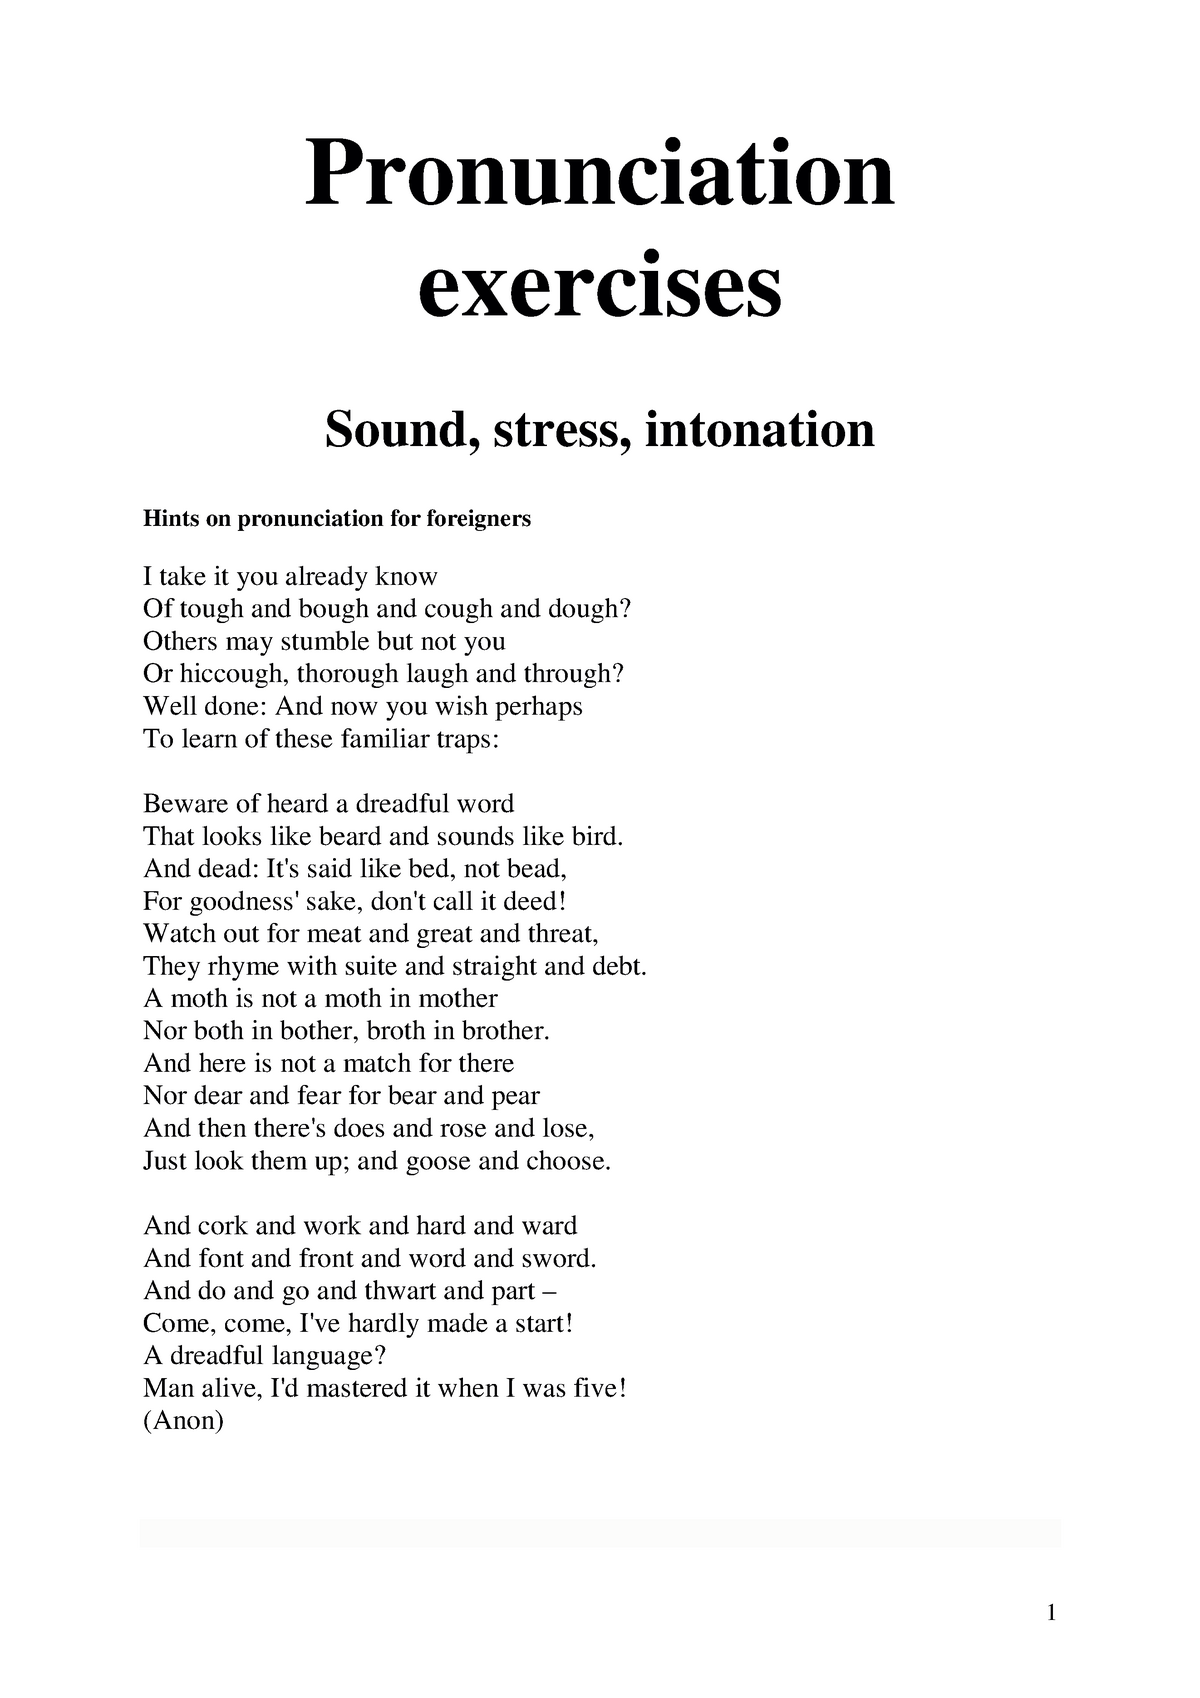 Pronunciation exercises - Phonetics Phonetics - StuDocu